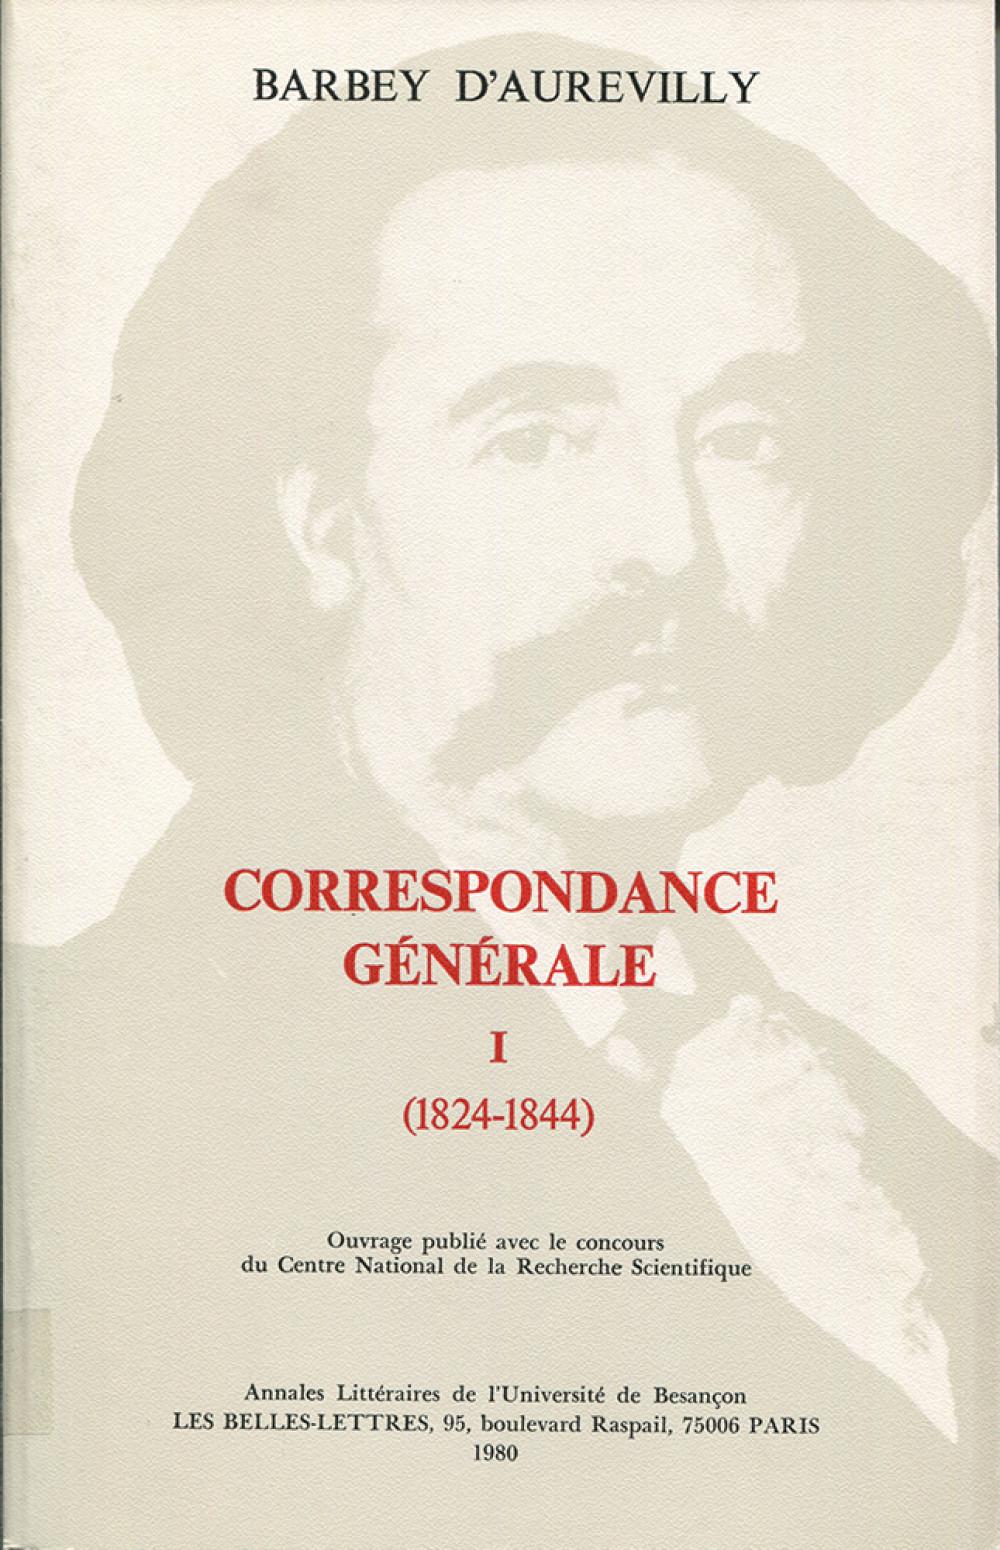 Correspondance générale I (1824-1844)